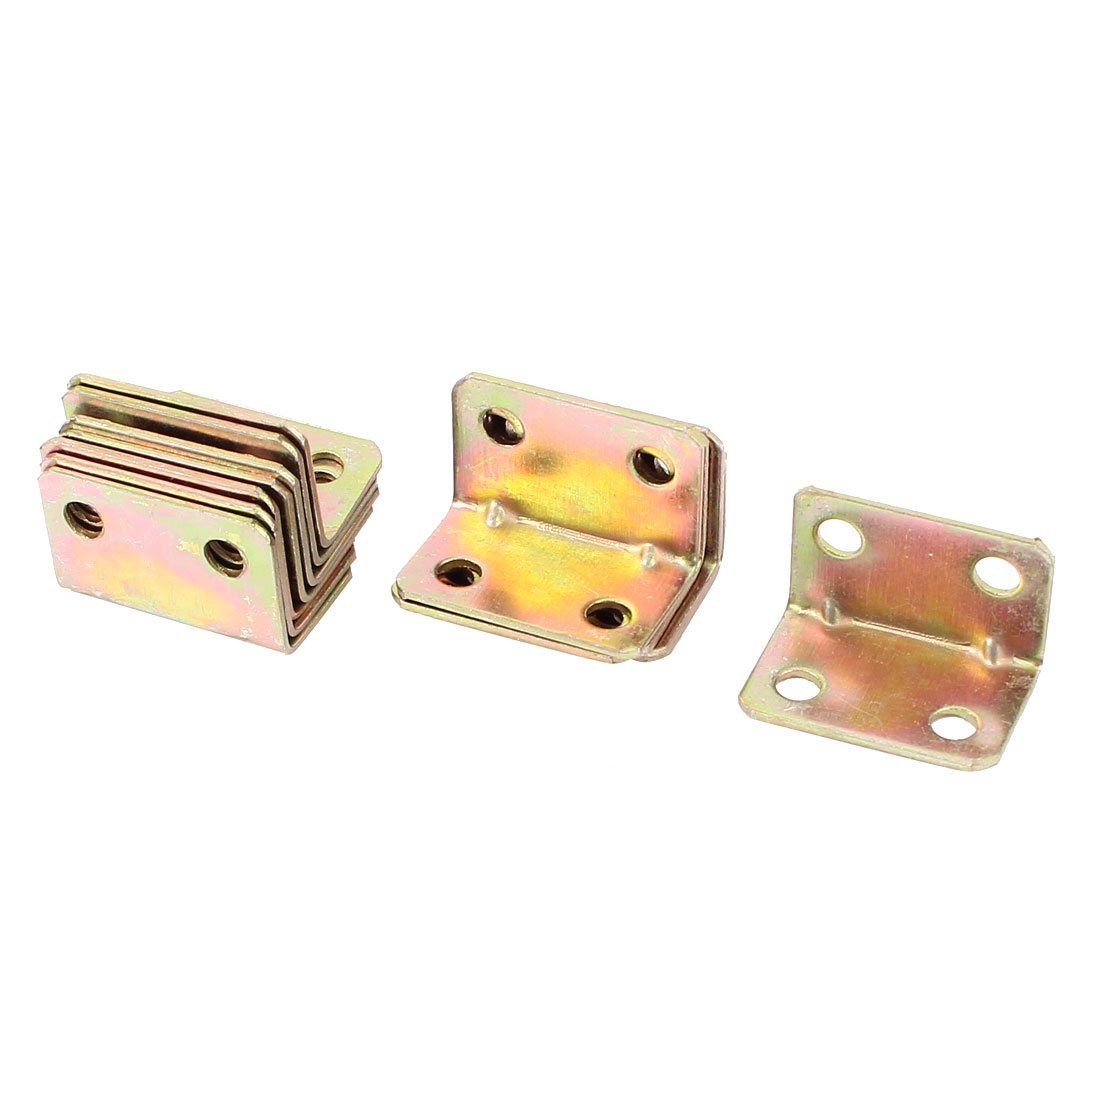 Furniture Fastener 4 Hole Corner Brace Angle Brackets Brass Tone 15pcs